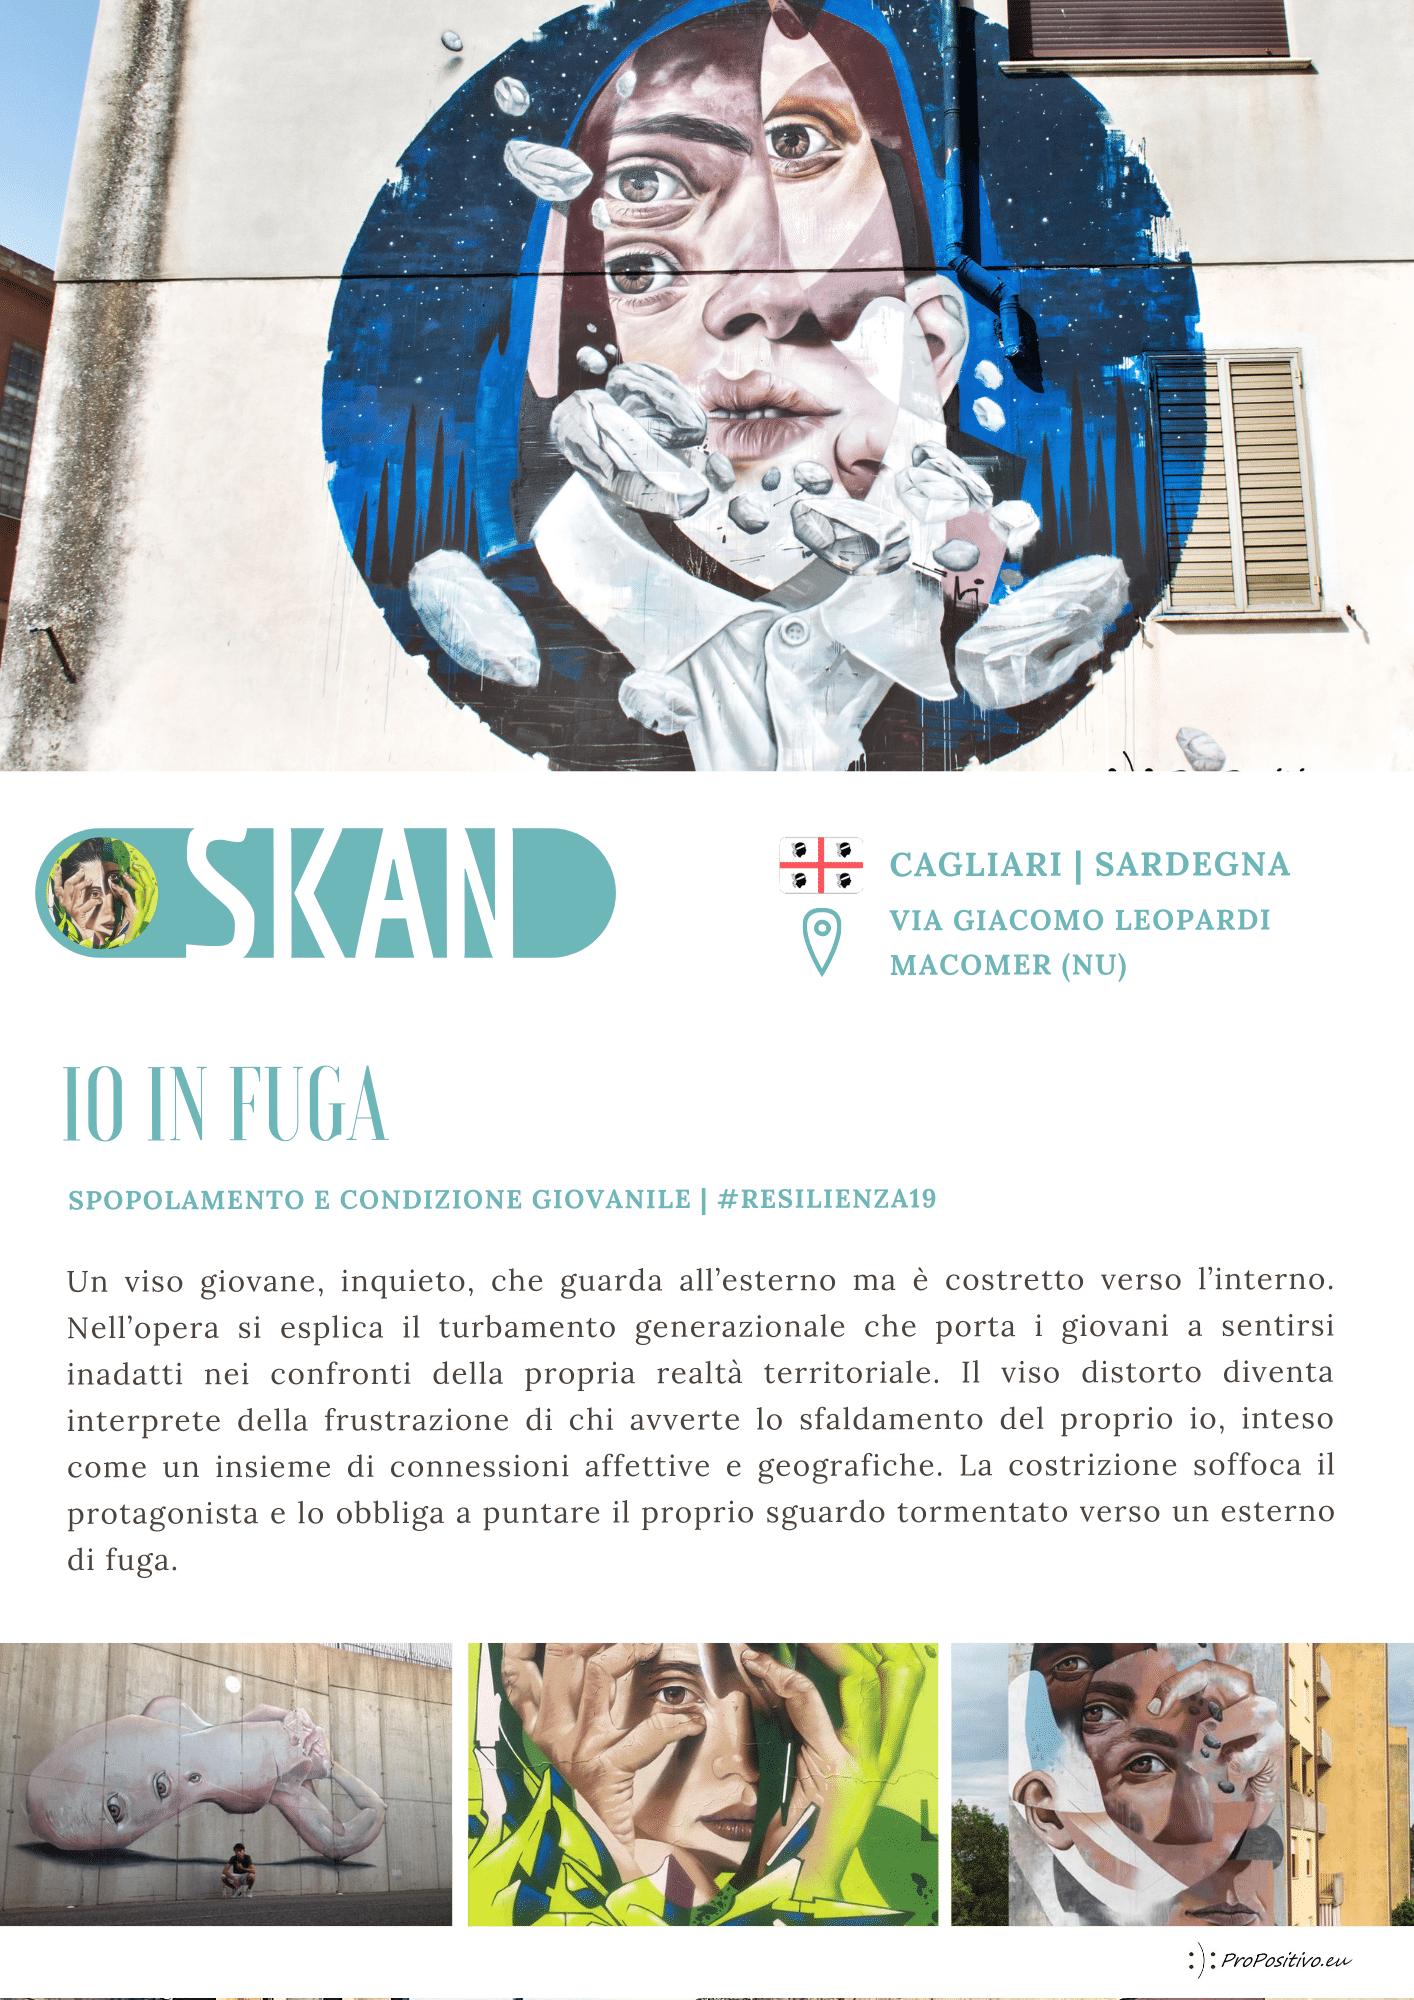 skan catalogo murales street art macomer sardegna festival resilienza propositivo 12